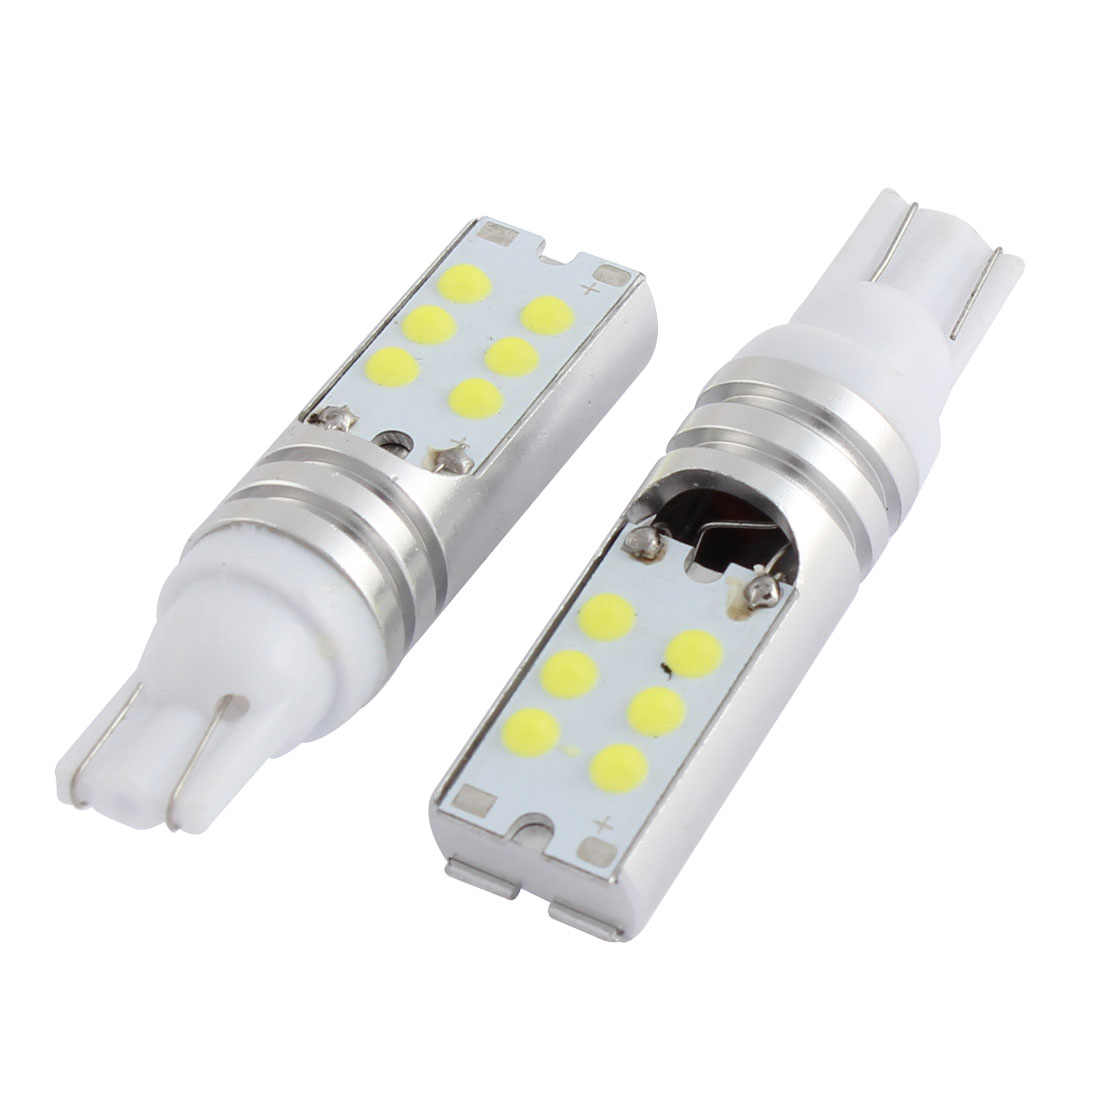 2 Pcs T10 921 W5W White COB 12-LEDs Side Light Wedge Lamp Bulb DC 12V Interior